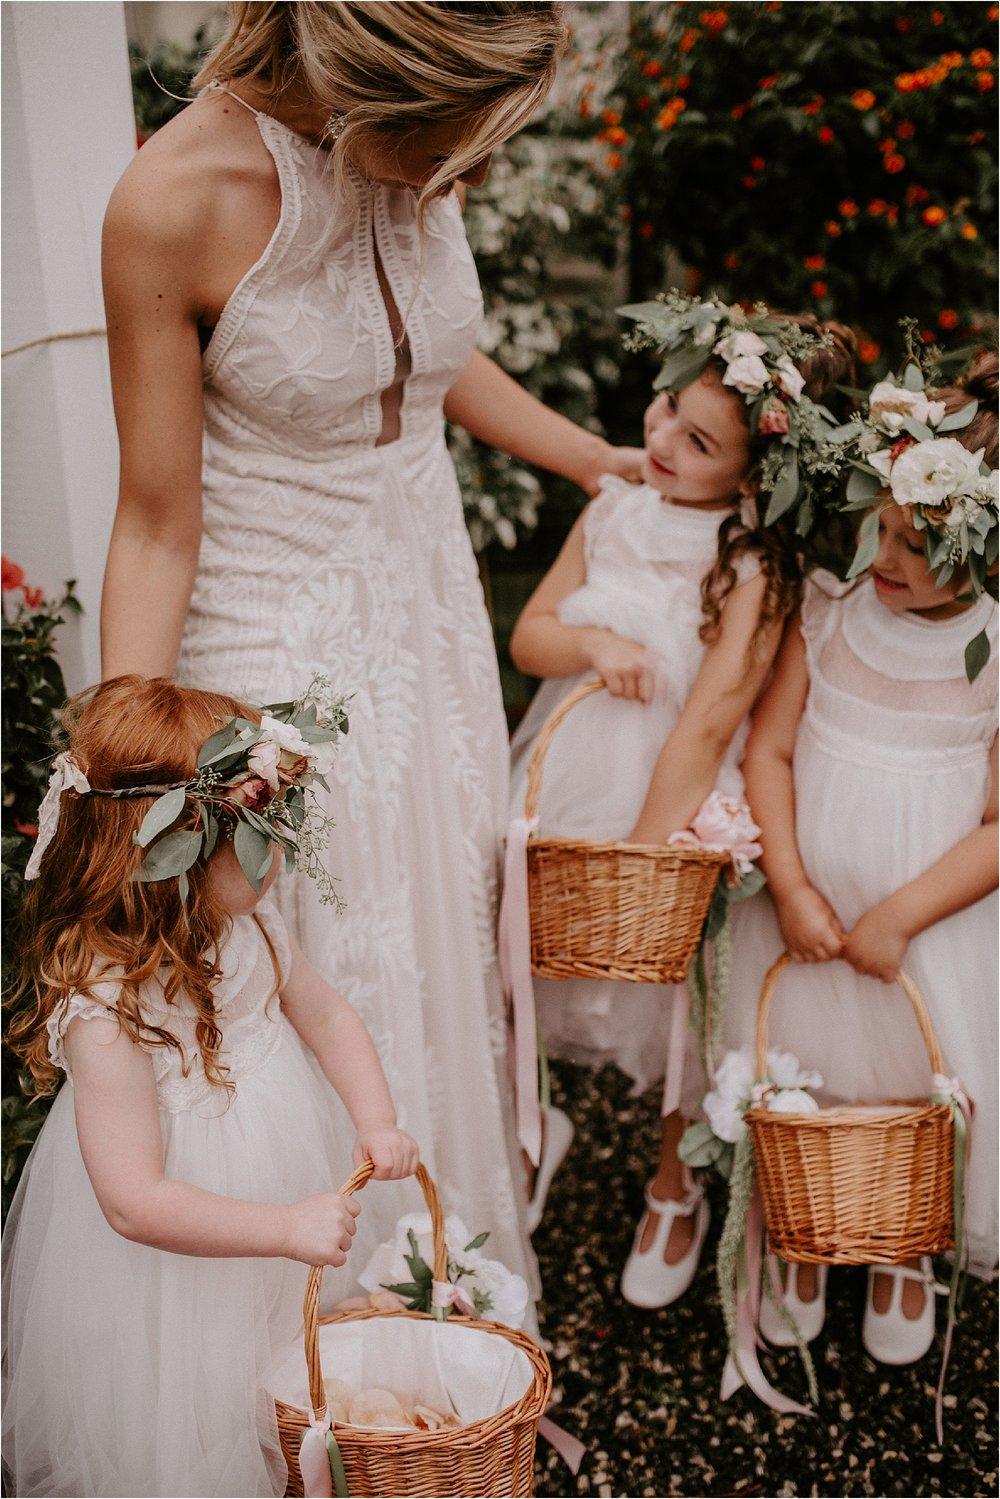 Sarah_Brookhart_Hortulus_Farm_Garden_and_Nursey_Wedding_Photographer_0038.jpg